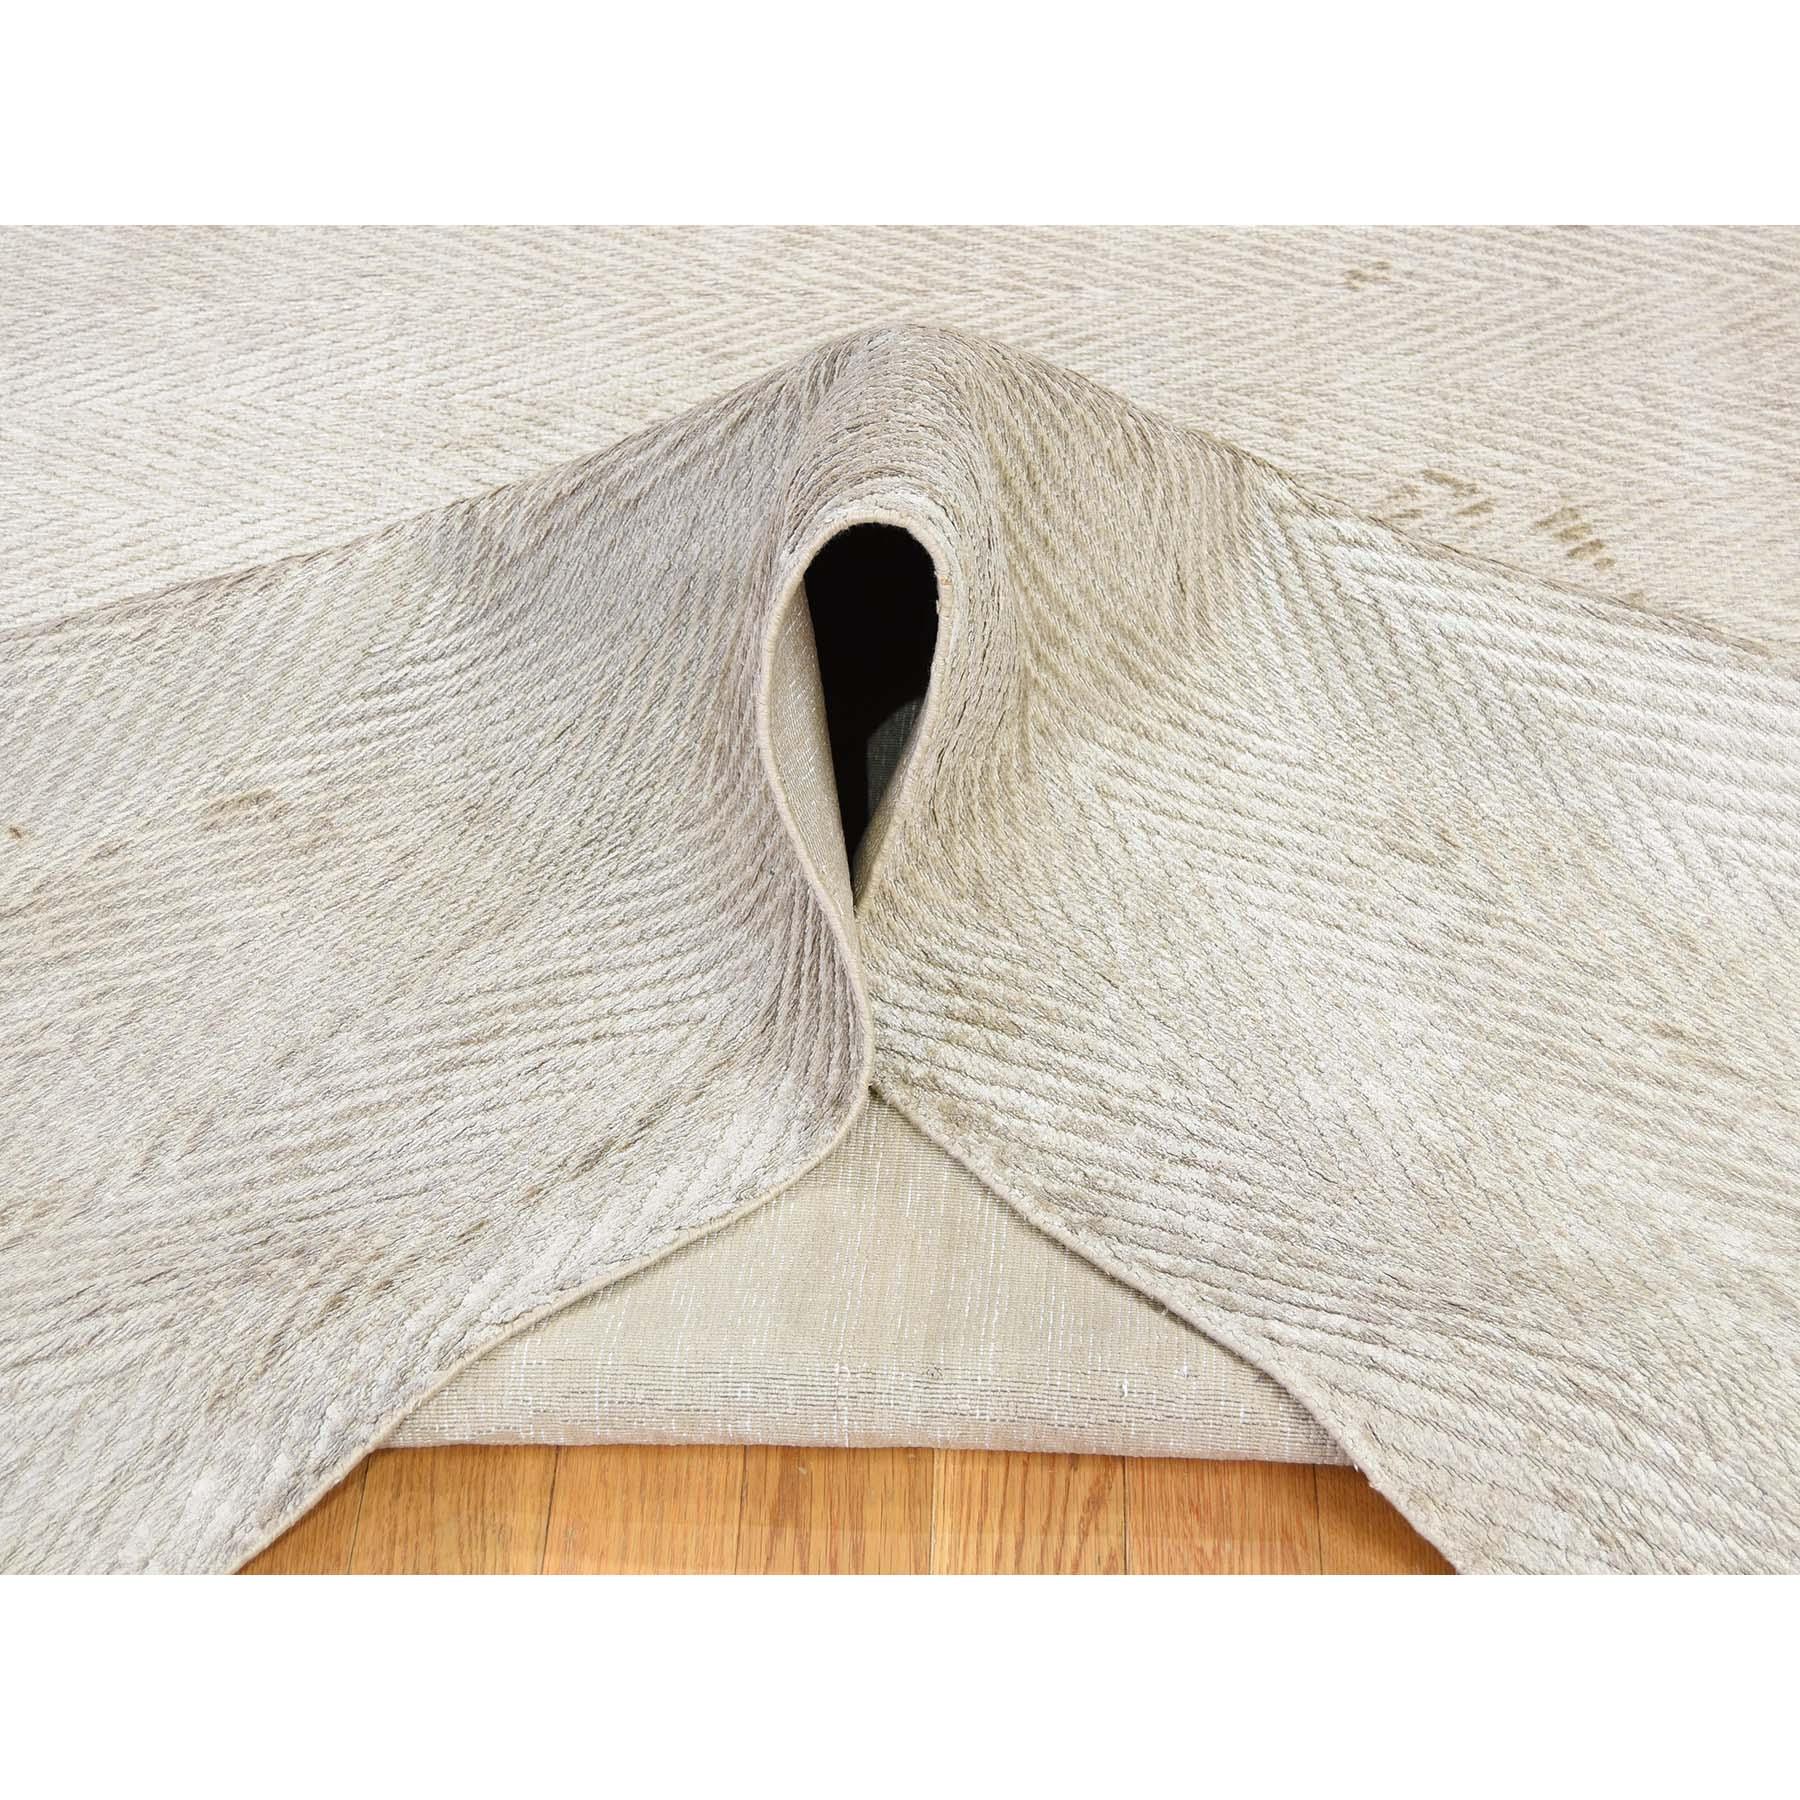 8-8 x11 8 Hand-Loomed Art Silk Tone on Tone Oriental Rug